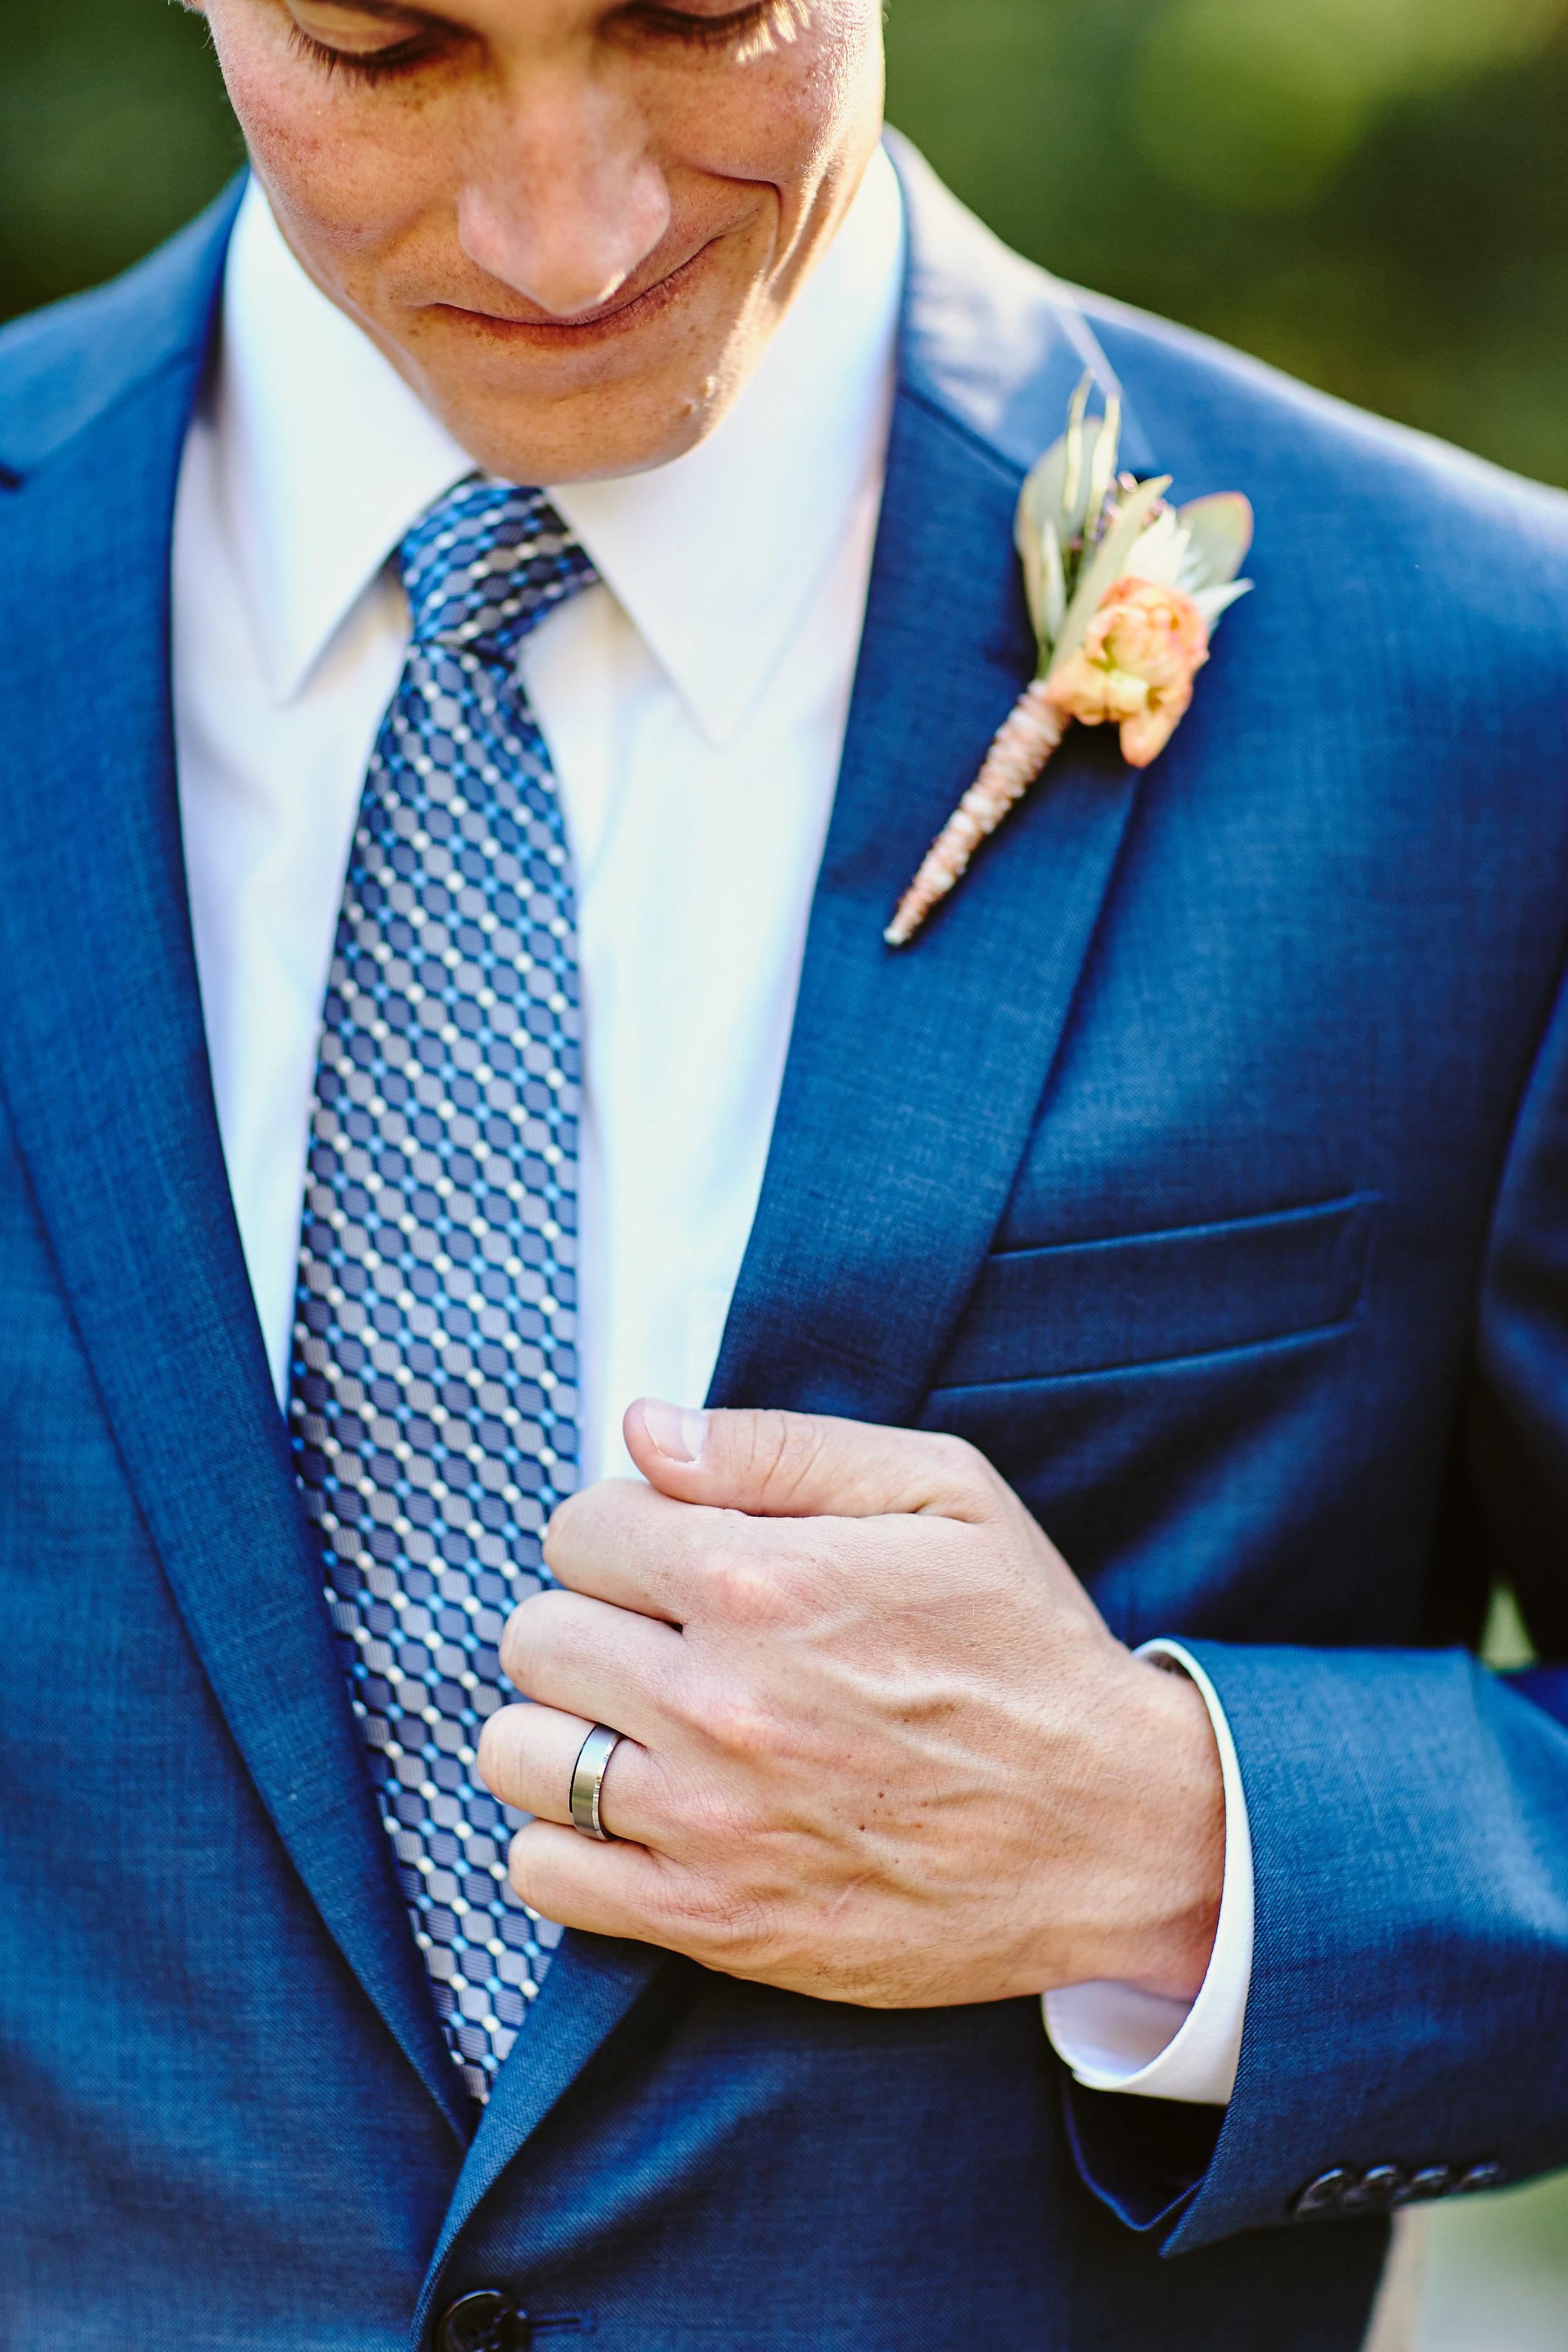 My handsome groom!